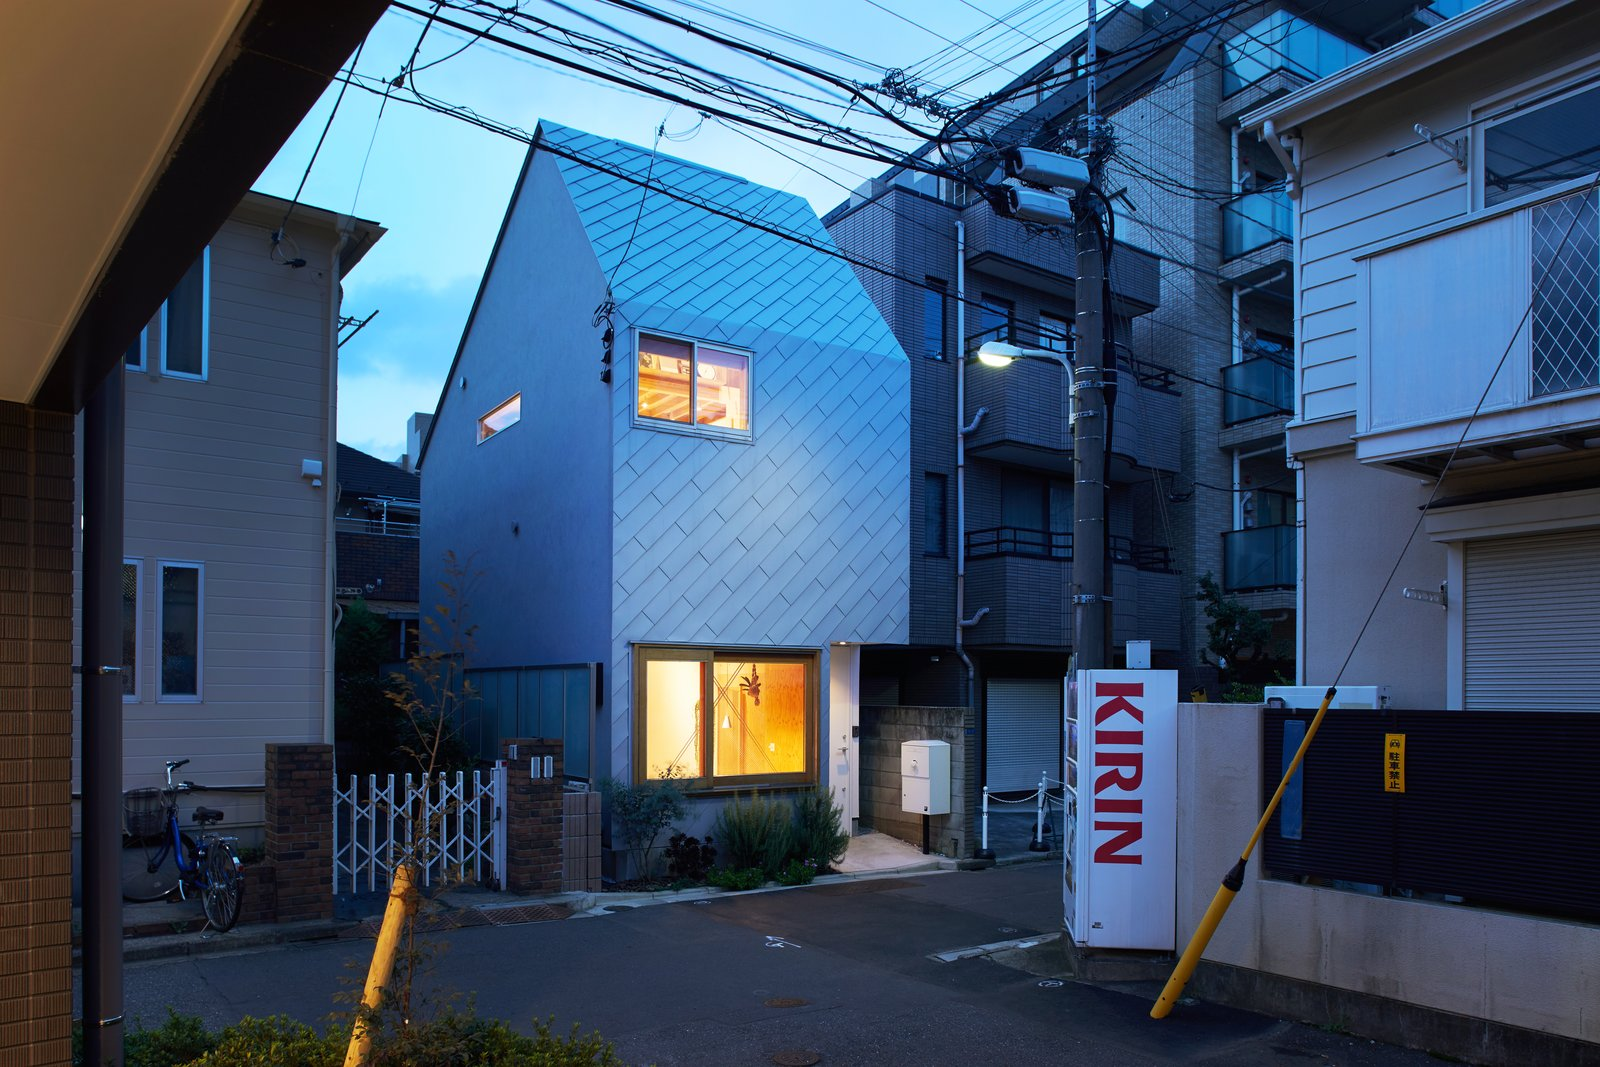 Milk Carton House Tenhachi Architect and Interior Design exterior